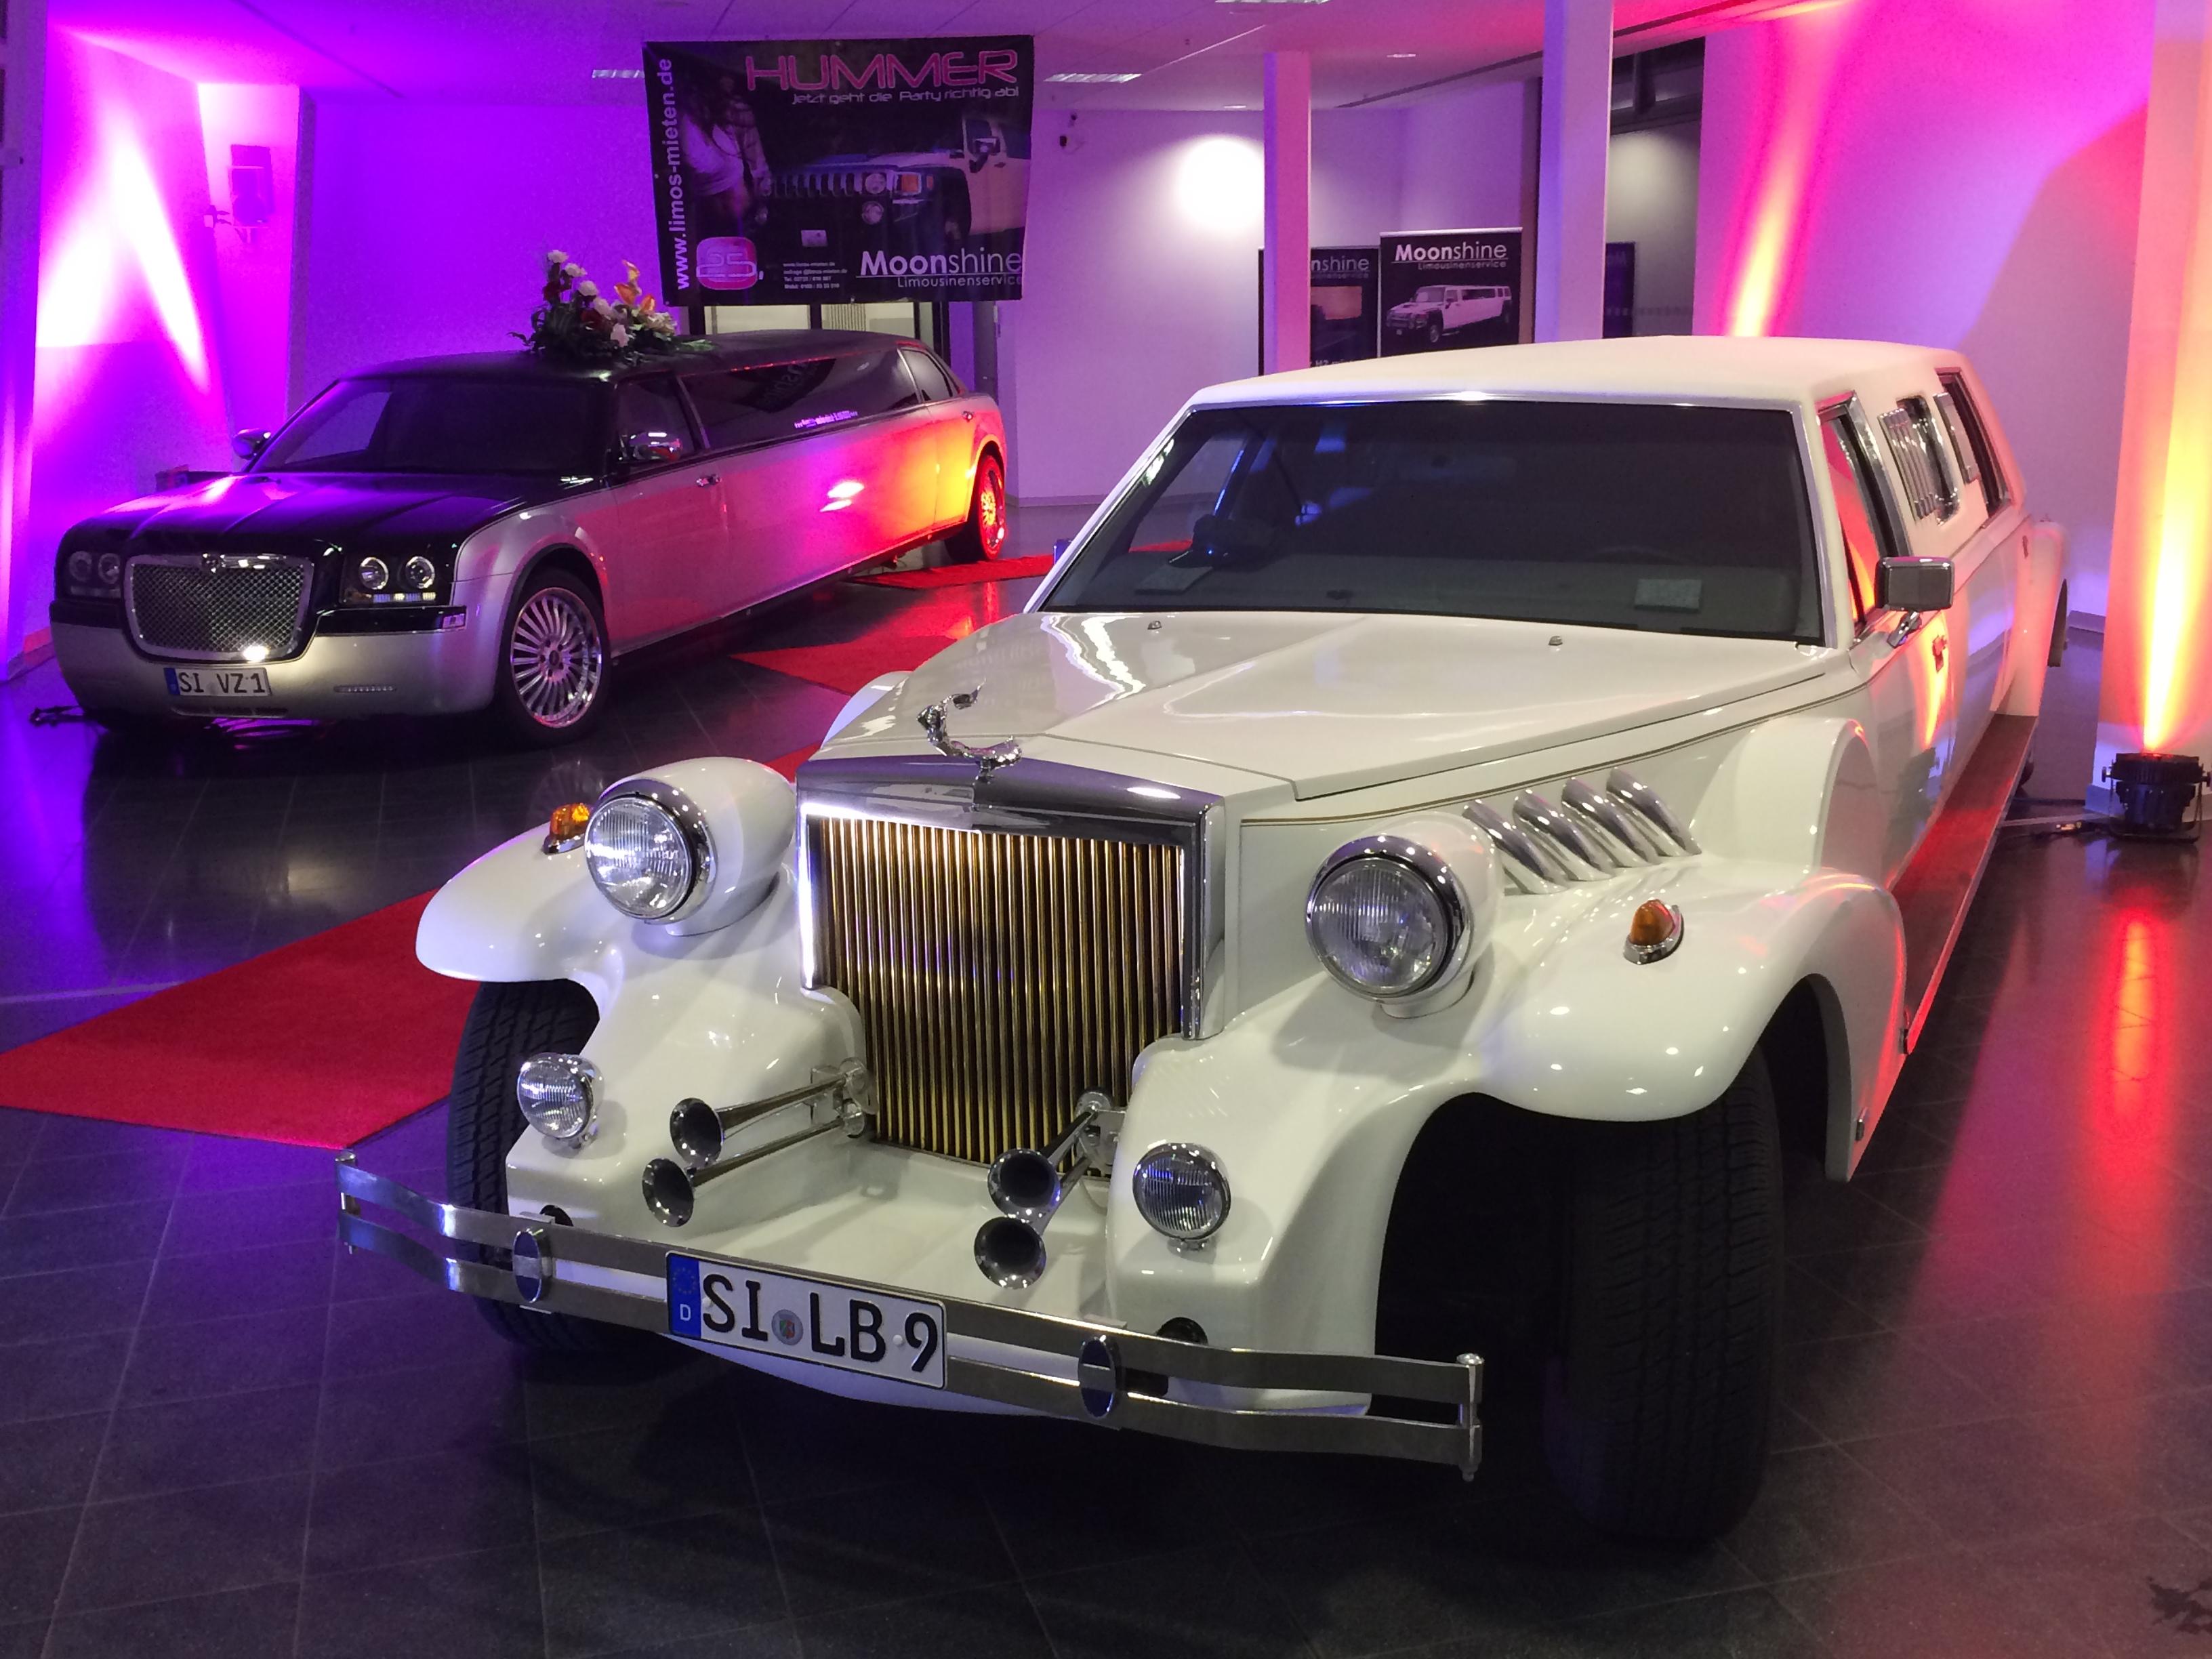 auto mieten hochzeit gallery of audi a lang luxus mieten auto hochzeit with auto mieten. Black Bedroom Furniture Sets. Home Design Ideas